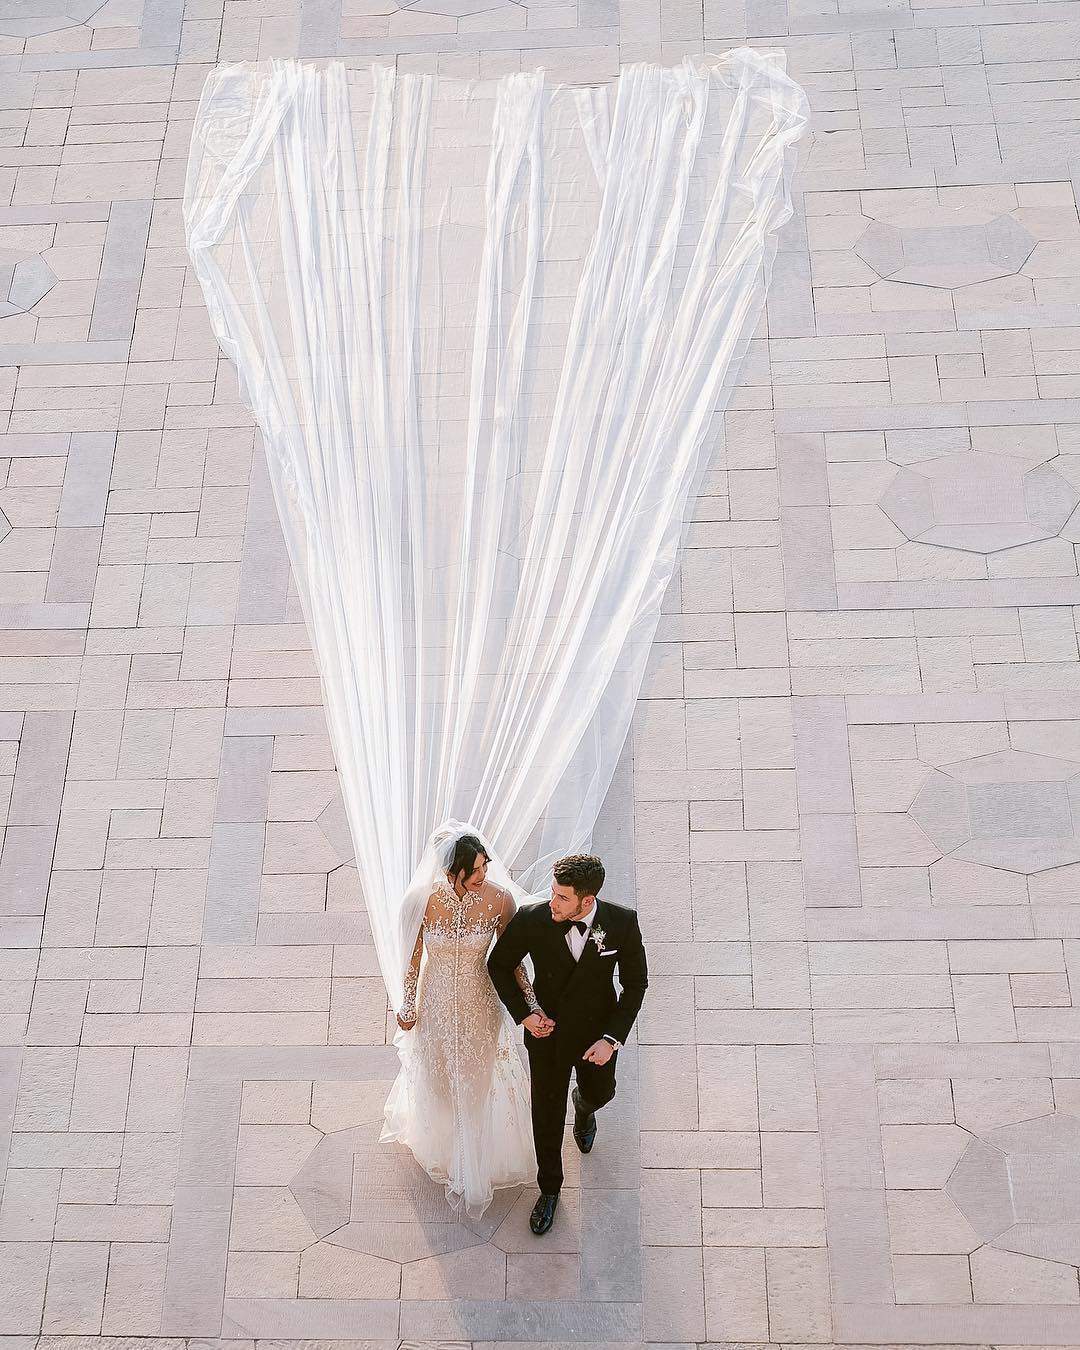 Nick Jonas shares a love-soaked photo with wife Priyanka Chopra